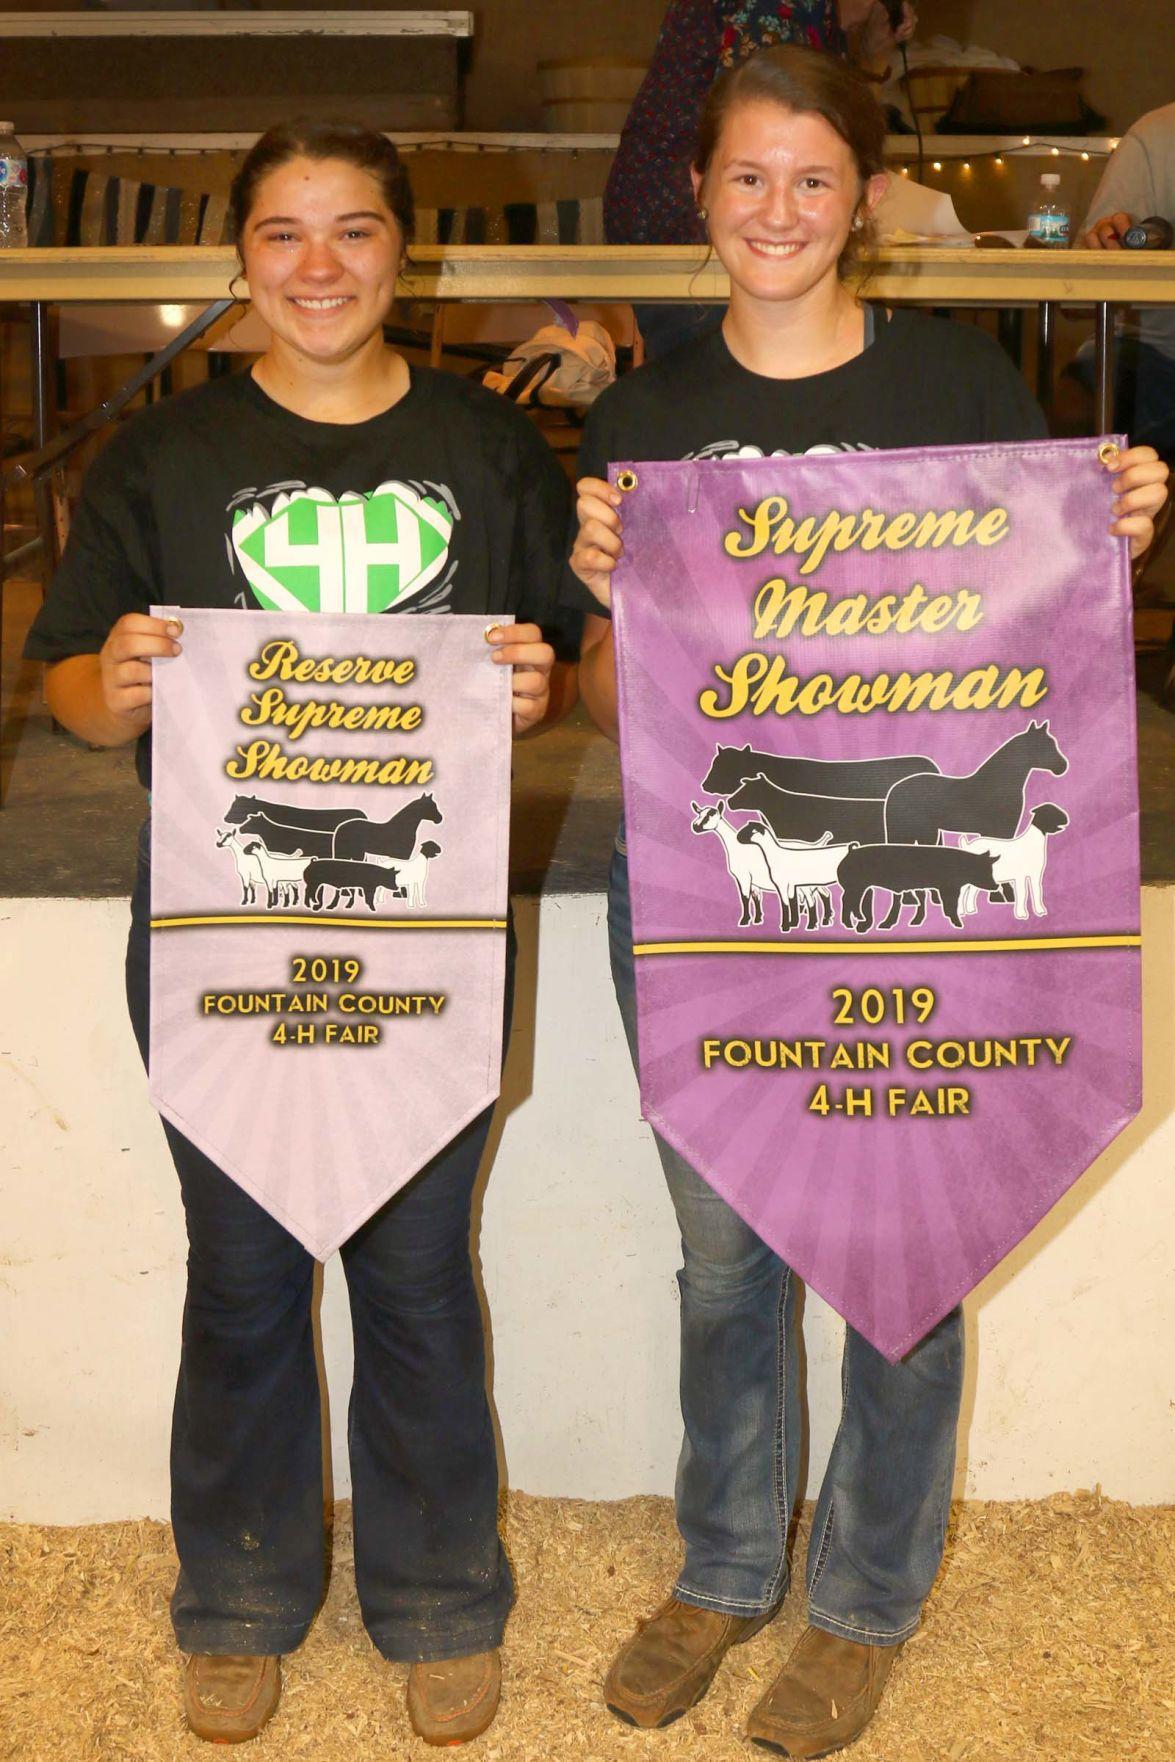 Fountain County names 4-H Master Showman   Wcinews   newsbug info